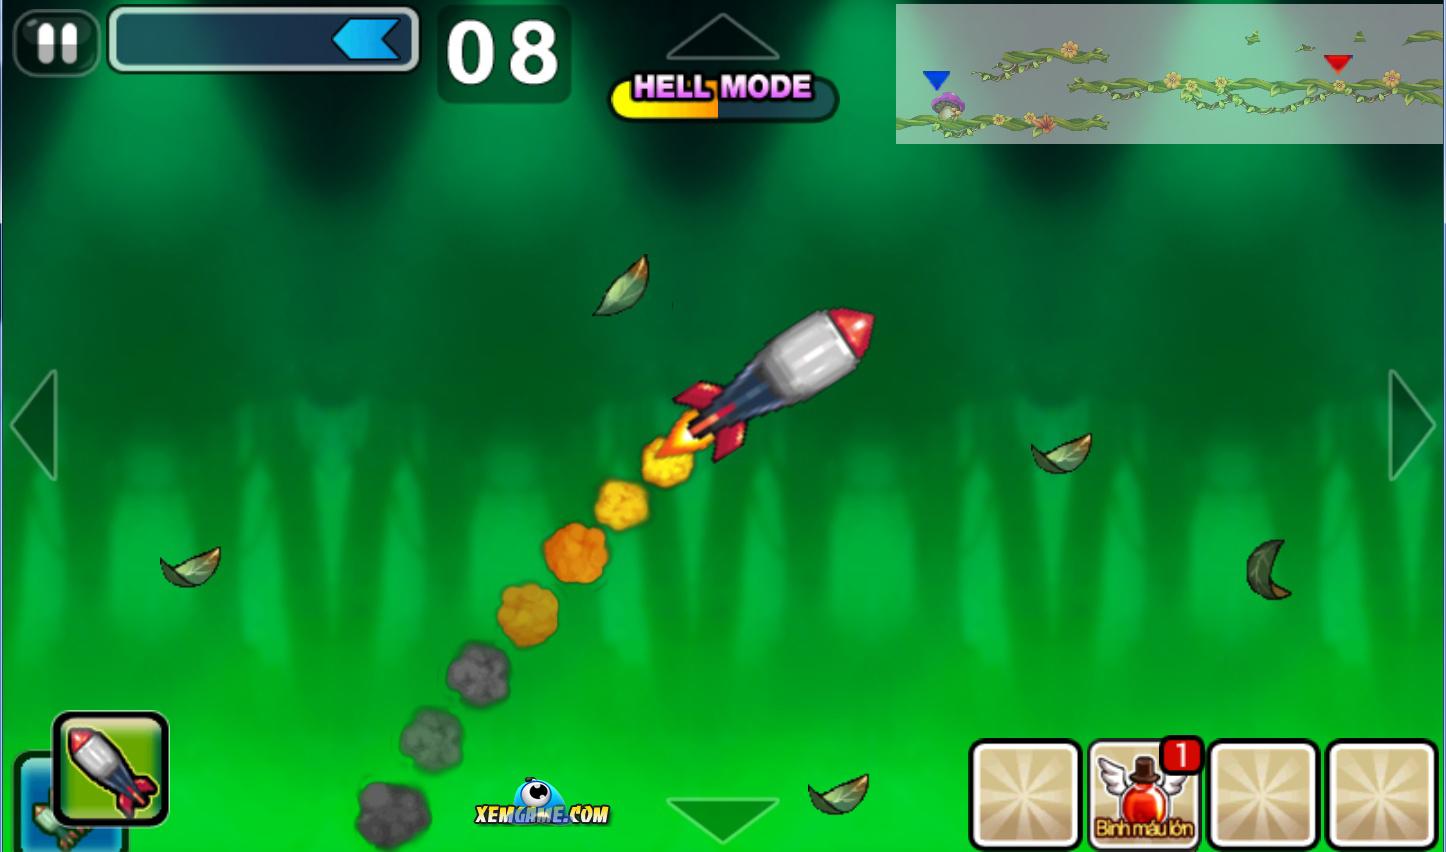 game-oppa_-tank-mobile-3.jpg (1446×852)